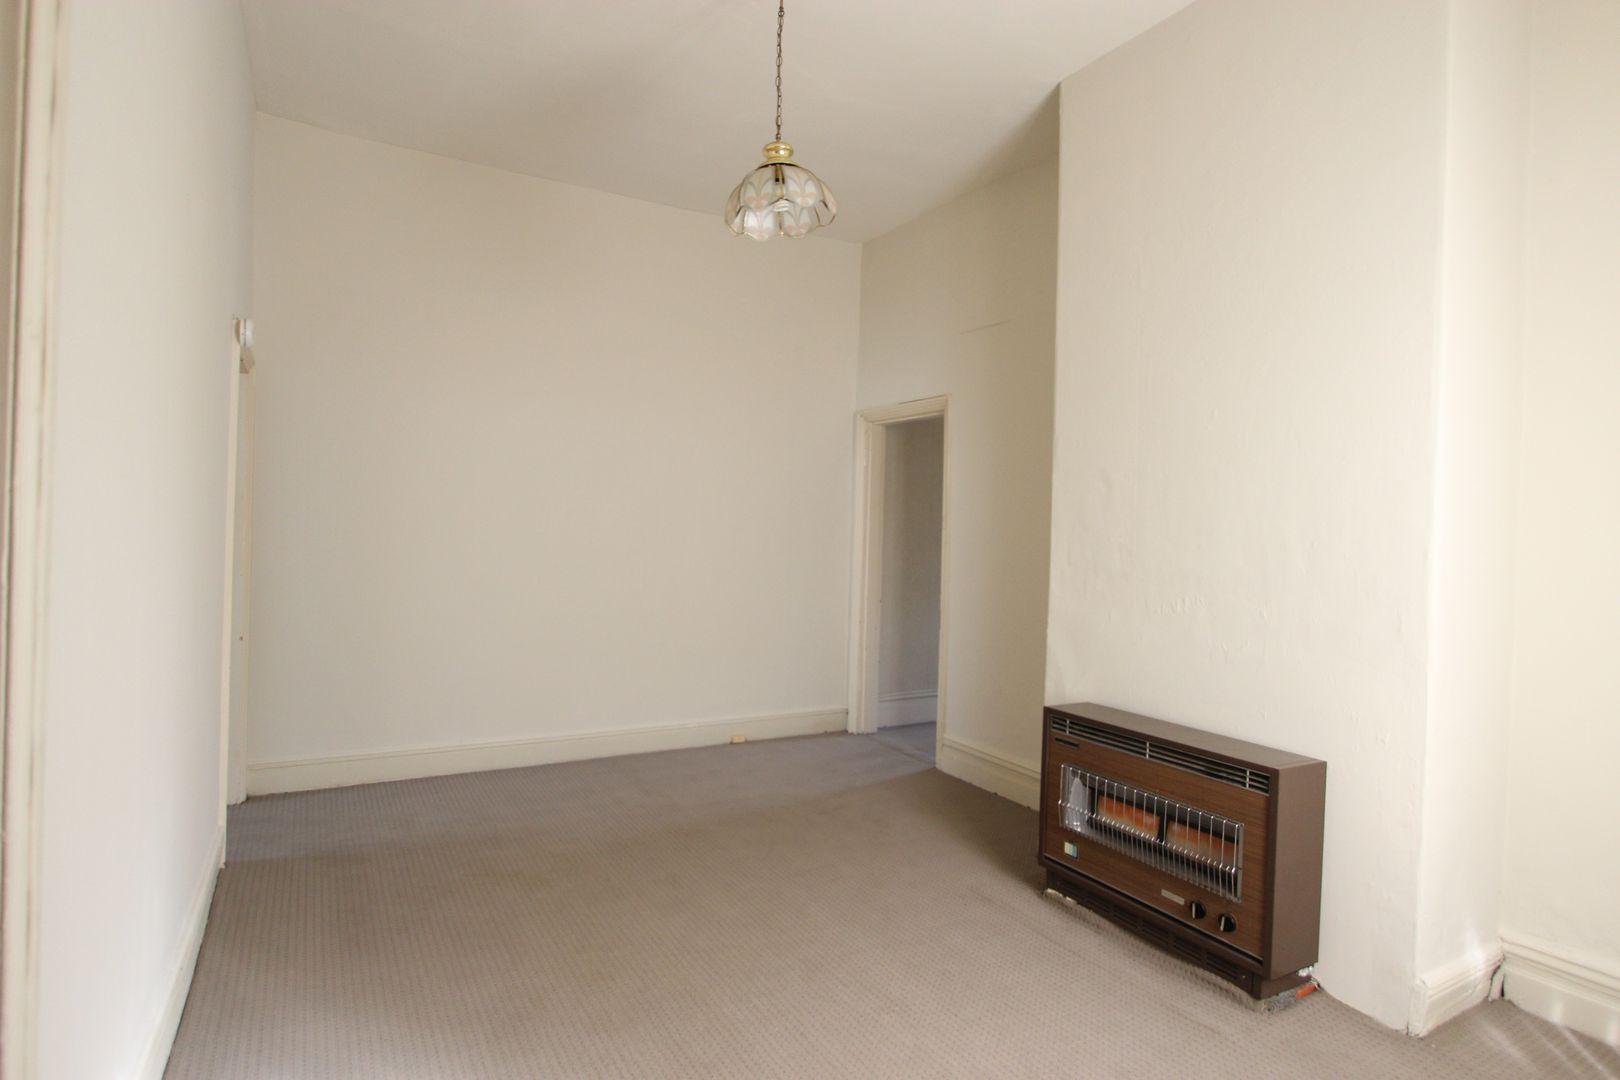 2 McCrory Street, Coburg VIC 3058, Image 2